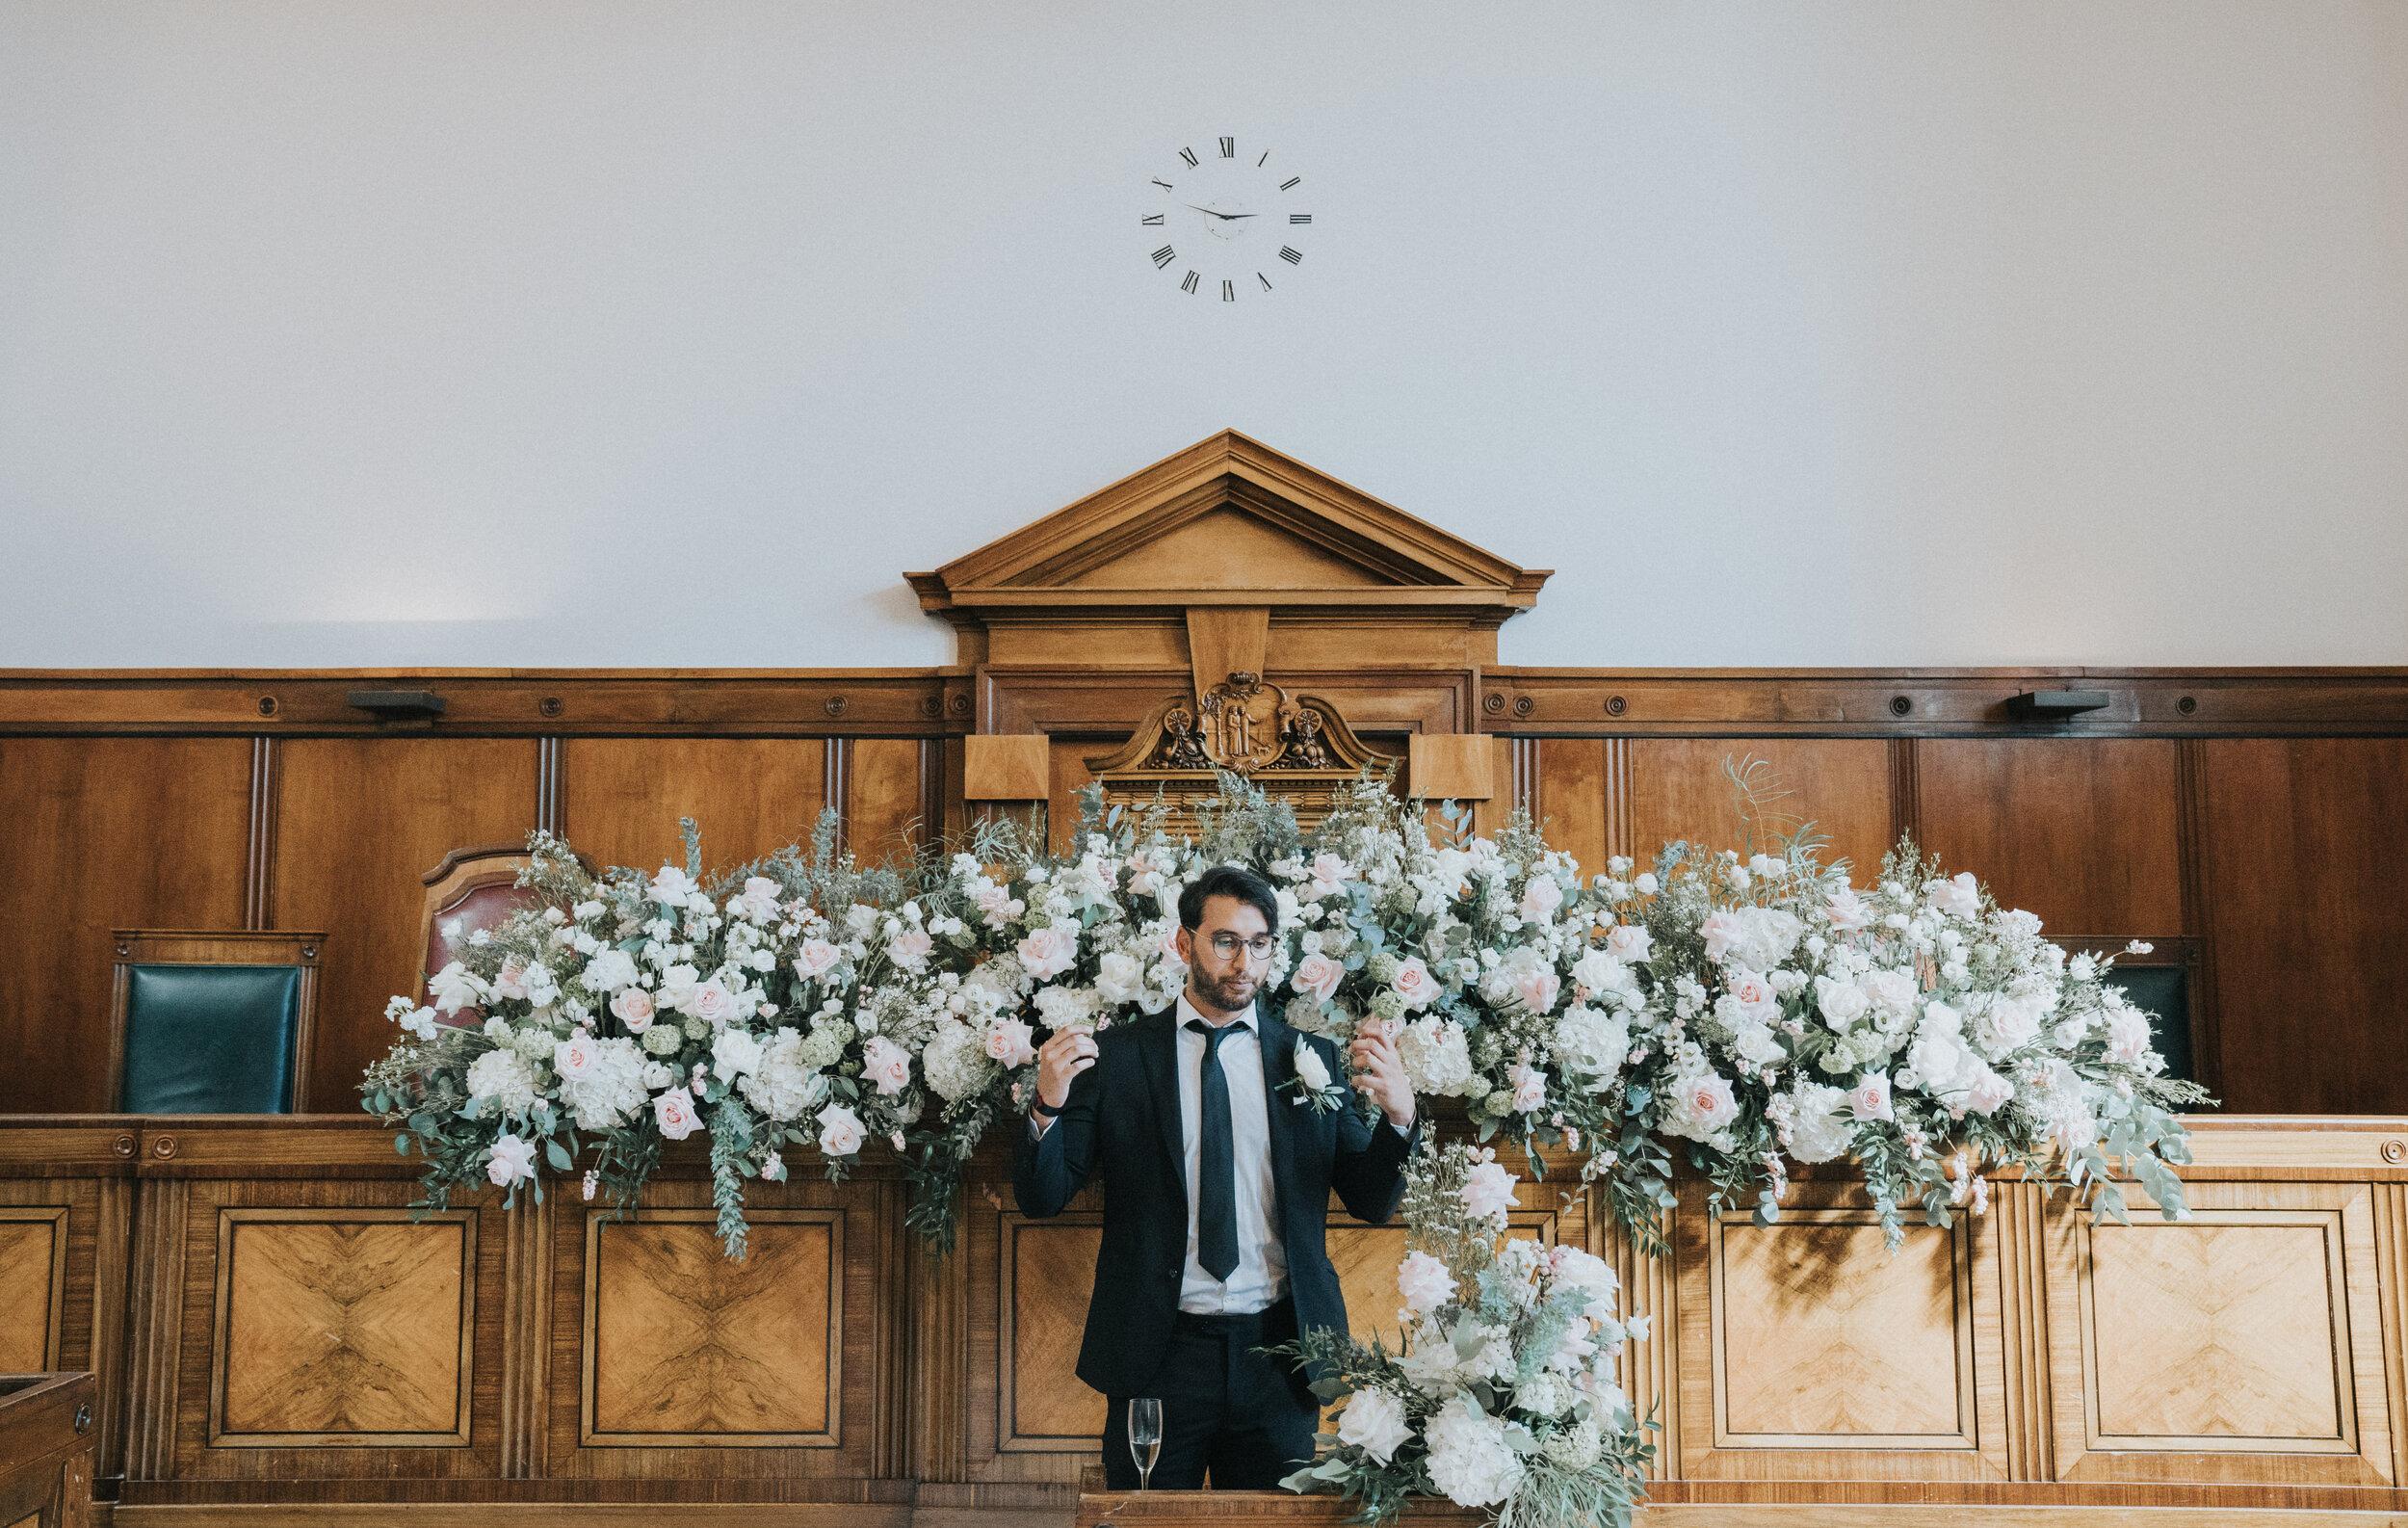 east-london-wedding-photographer-videographer-patriot-square-apartments-49